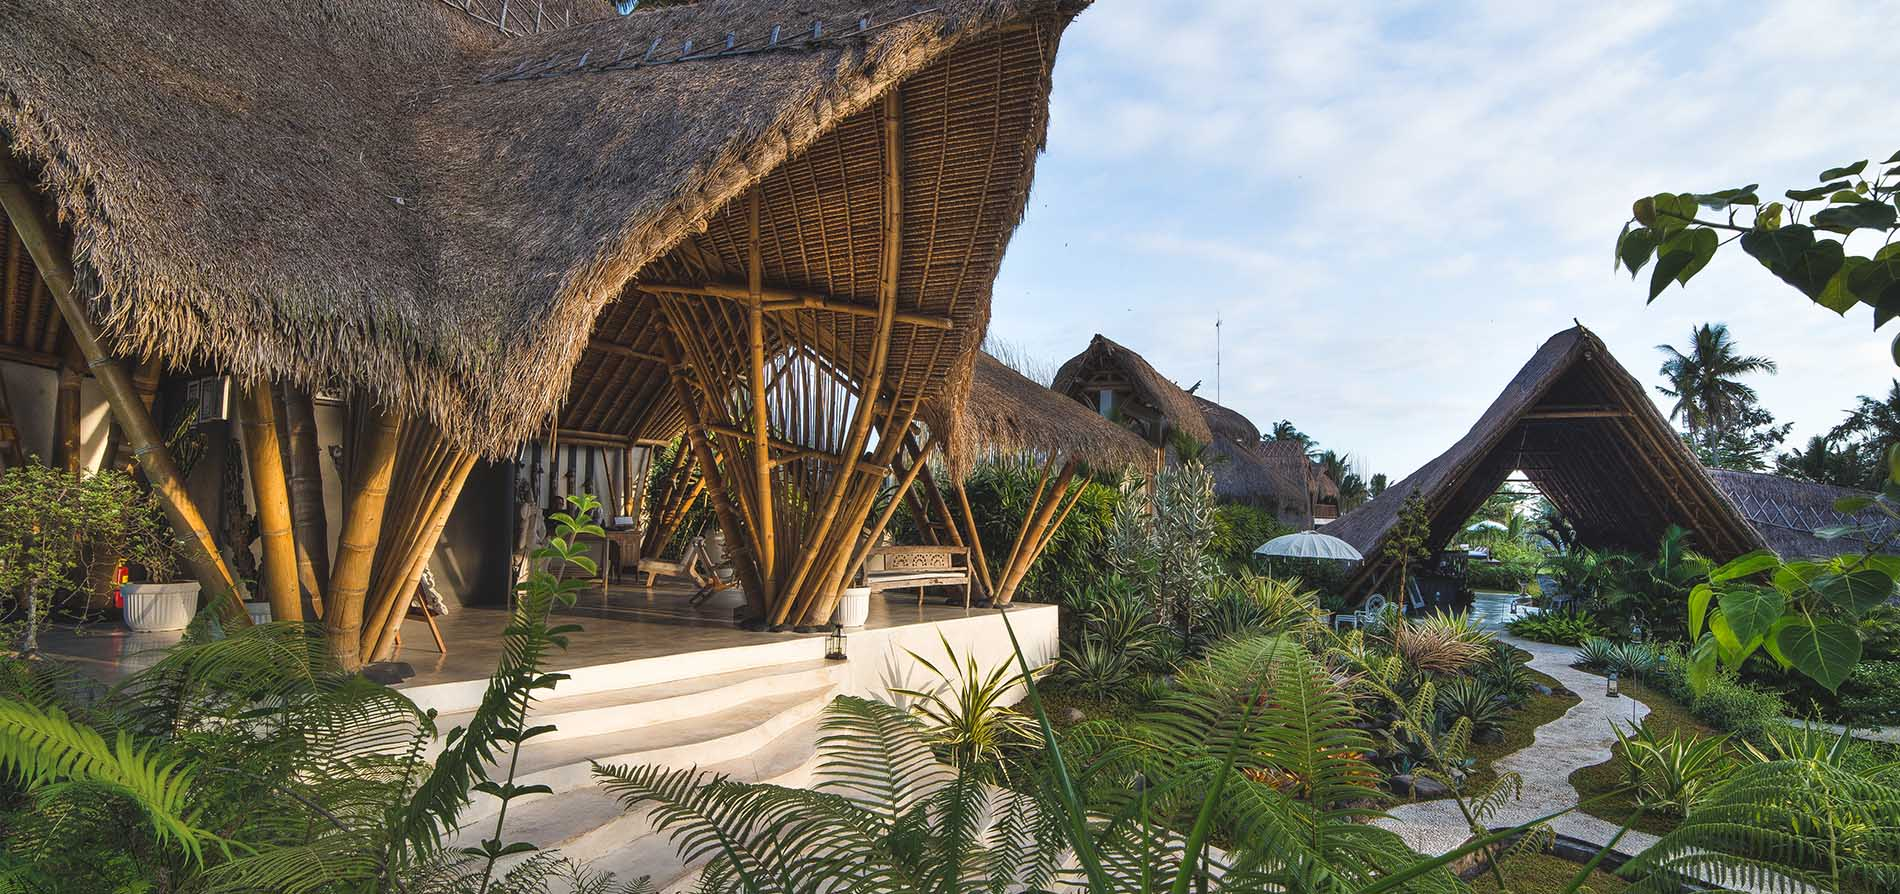 Luxury Resort In Bali The Best Boutique Hotel In Ubud